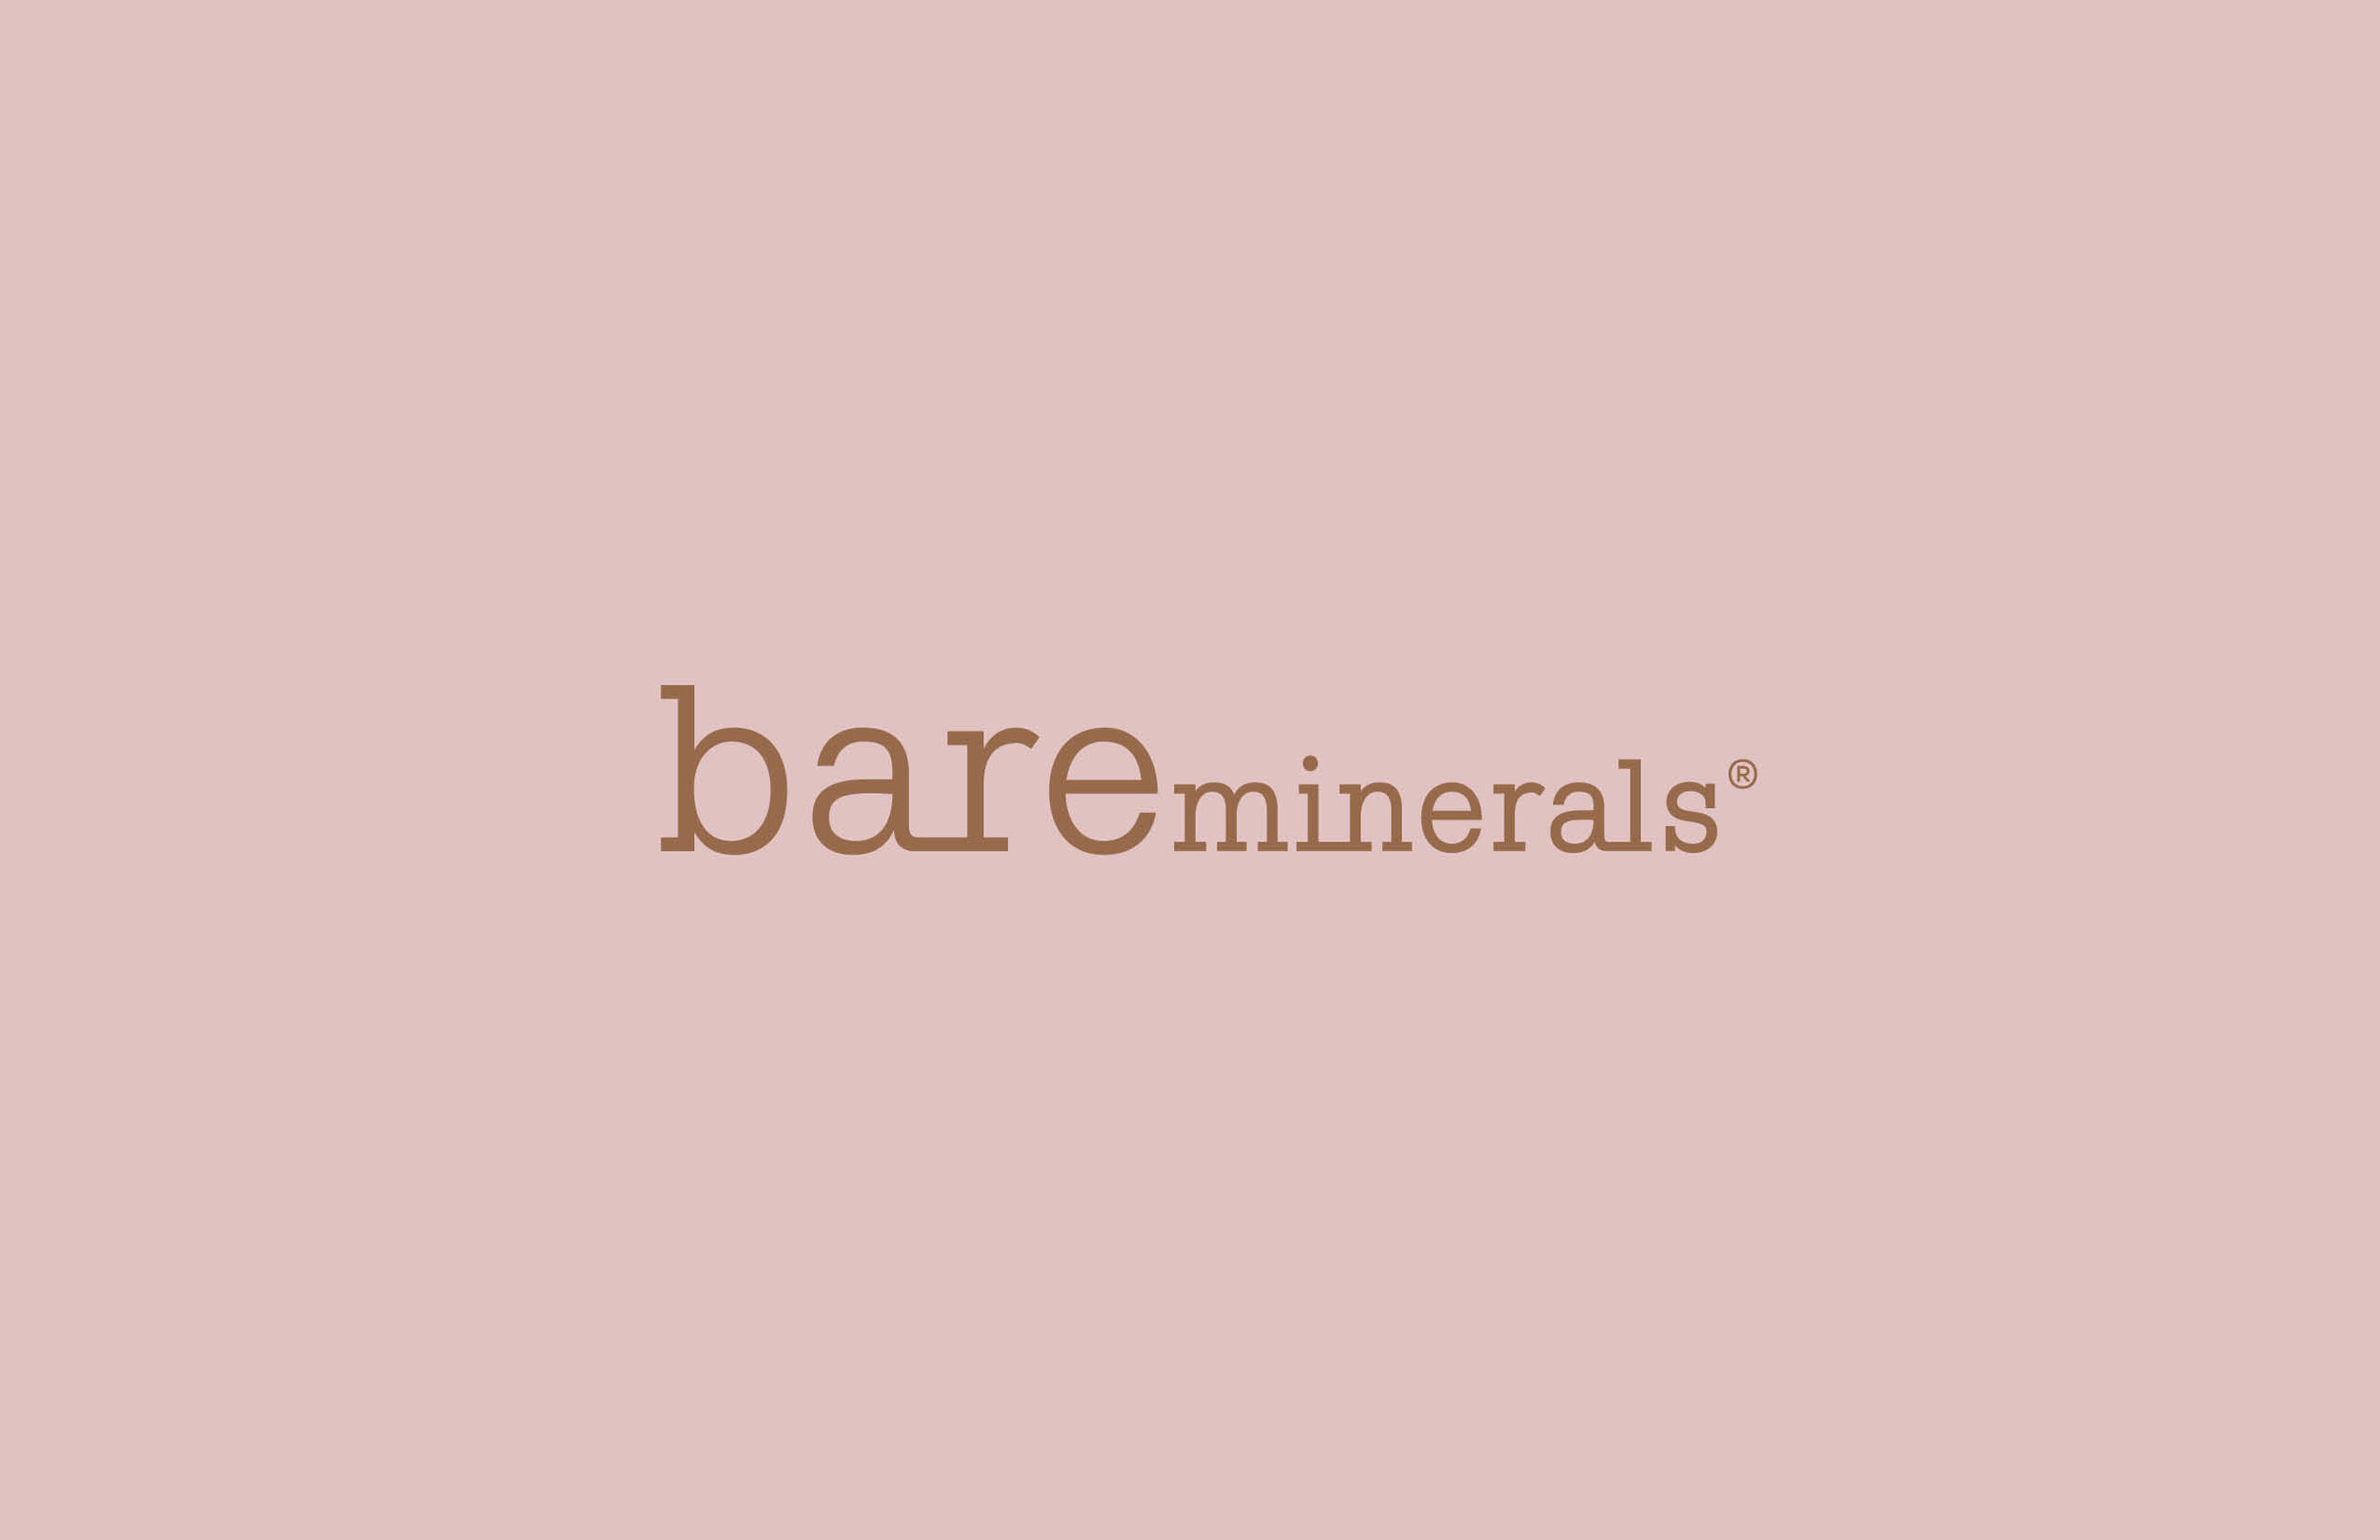 bareminerals fragrance free.jpg